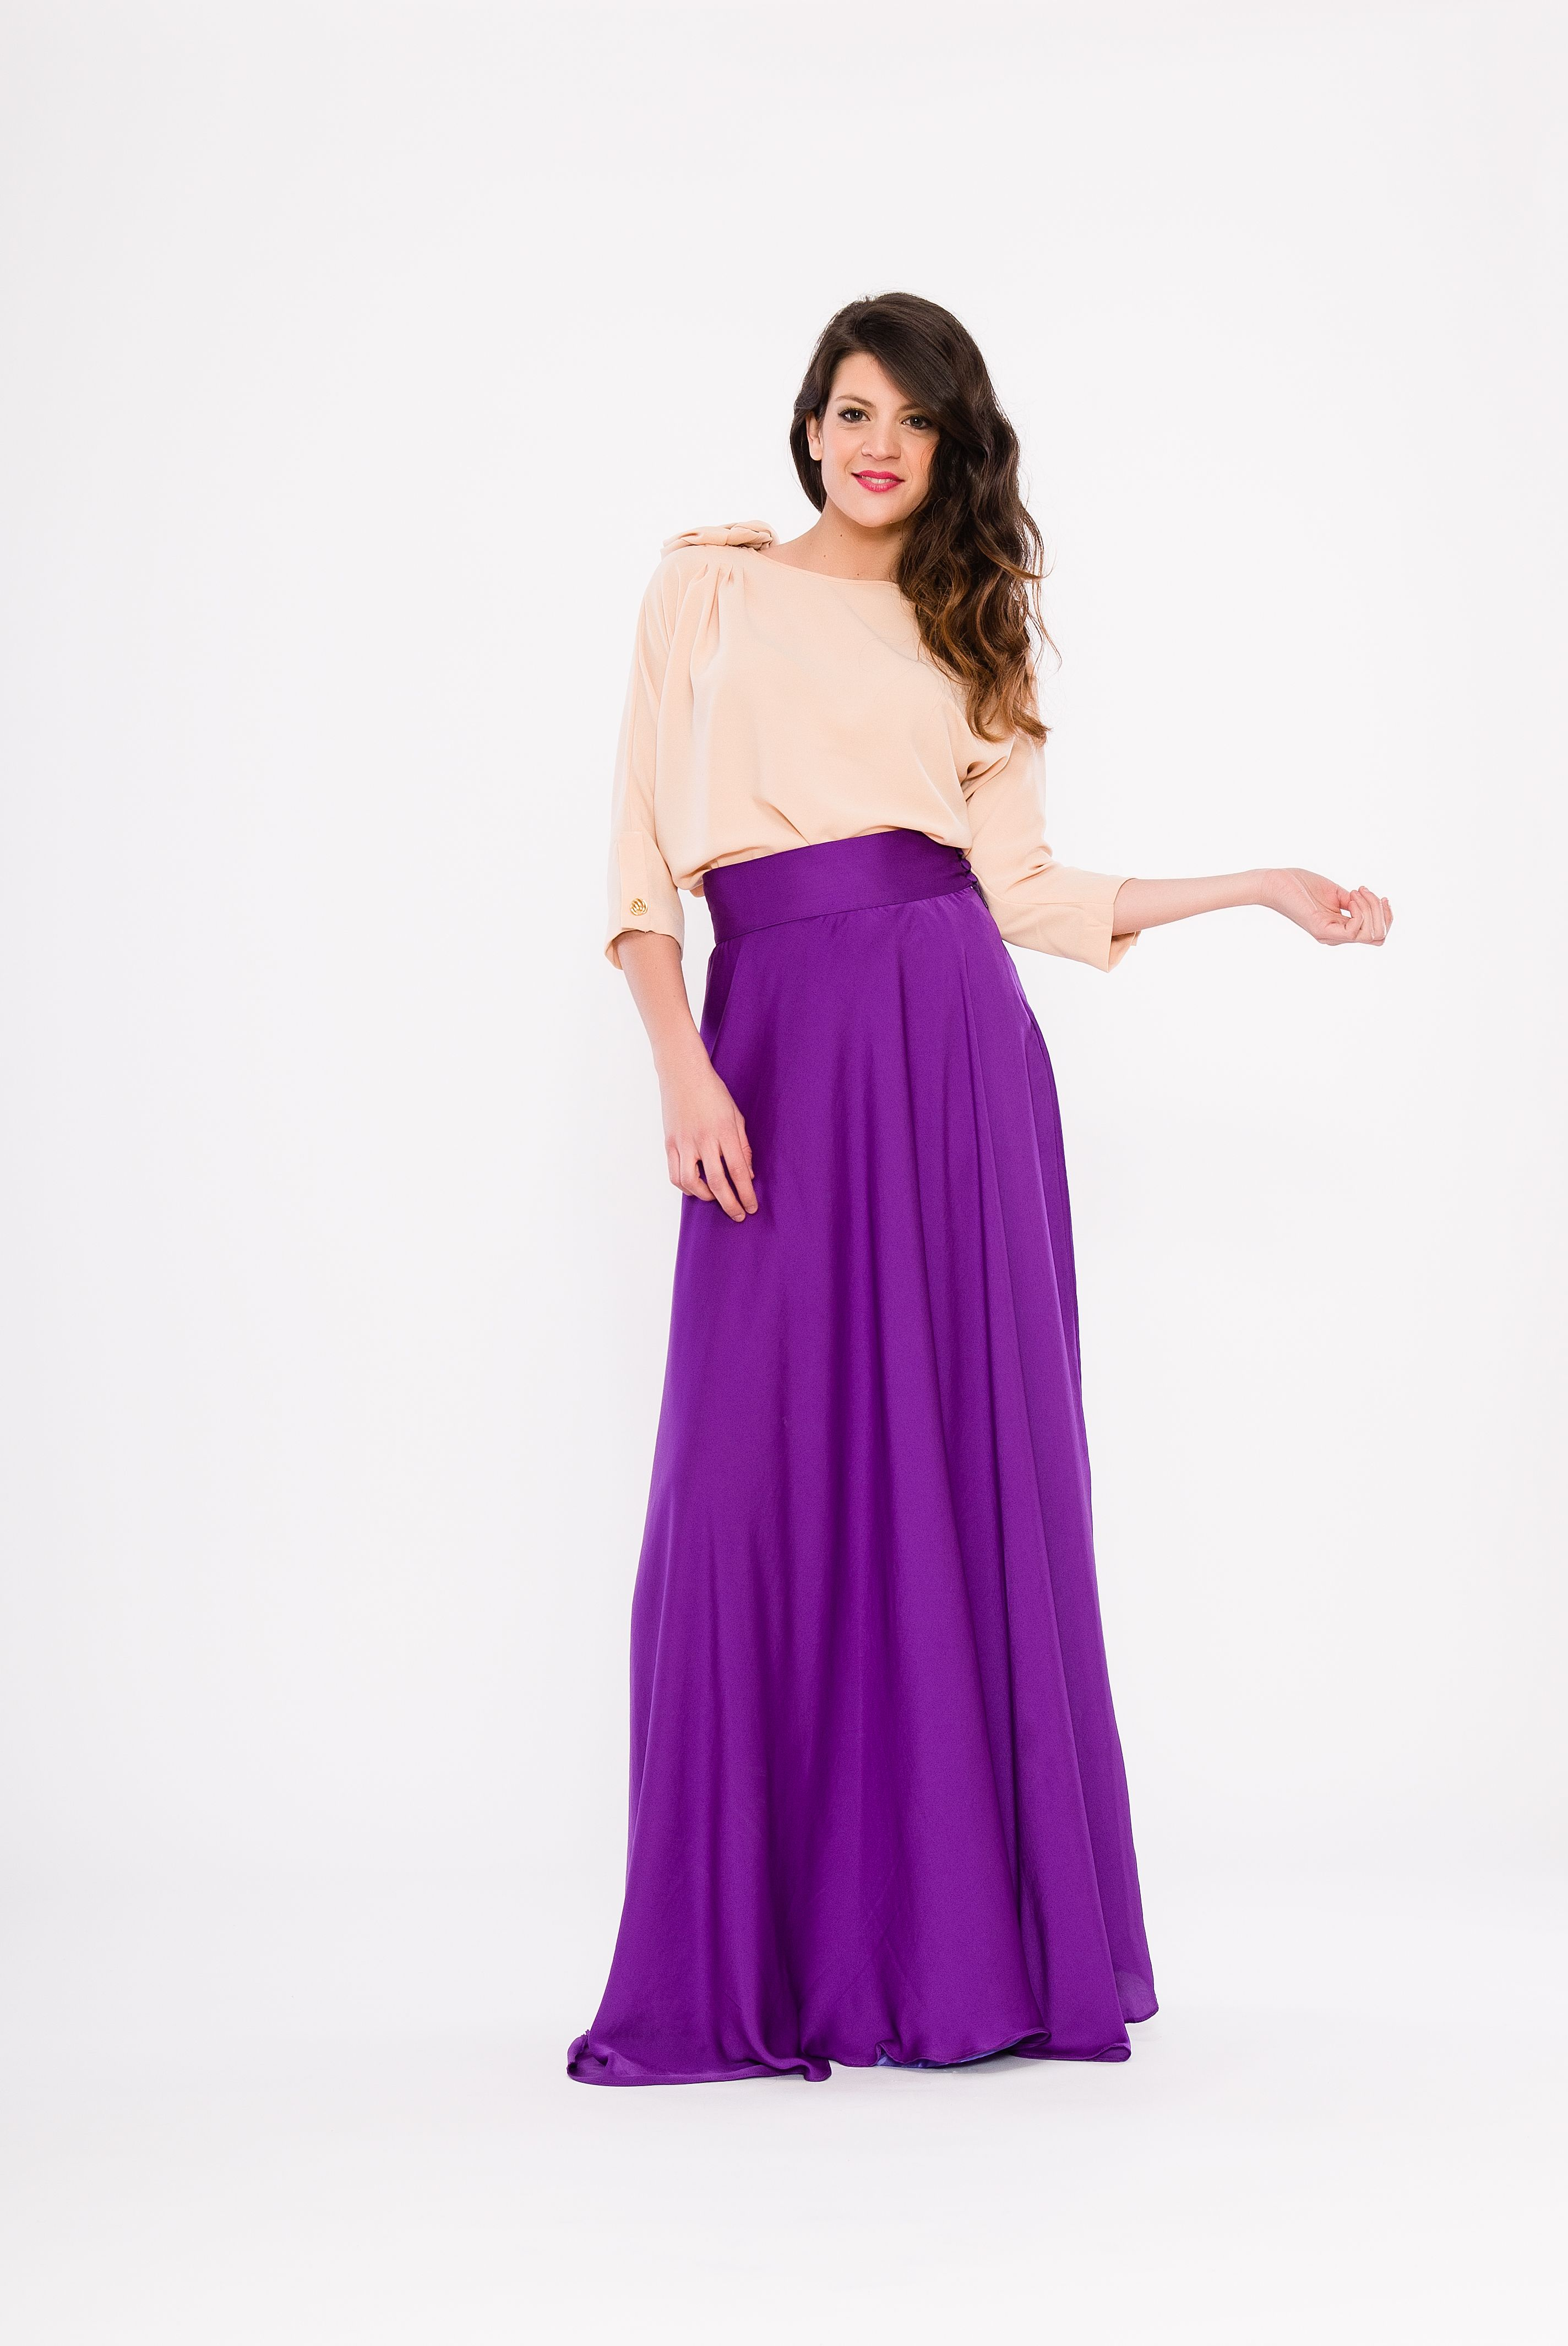 Falda morada y blusa maquillaje | faldas largas | Pinterest | Falda ...